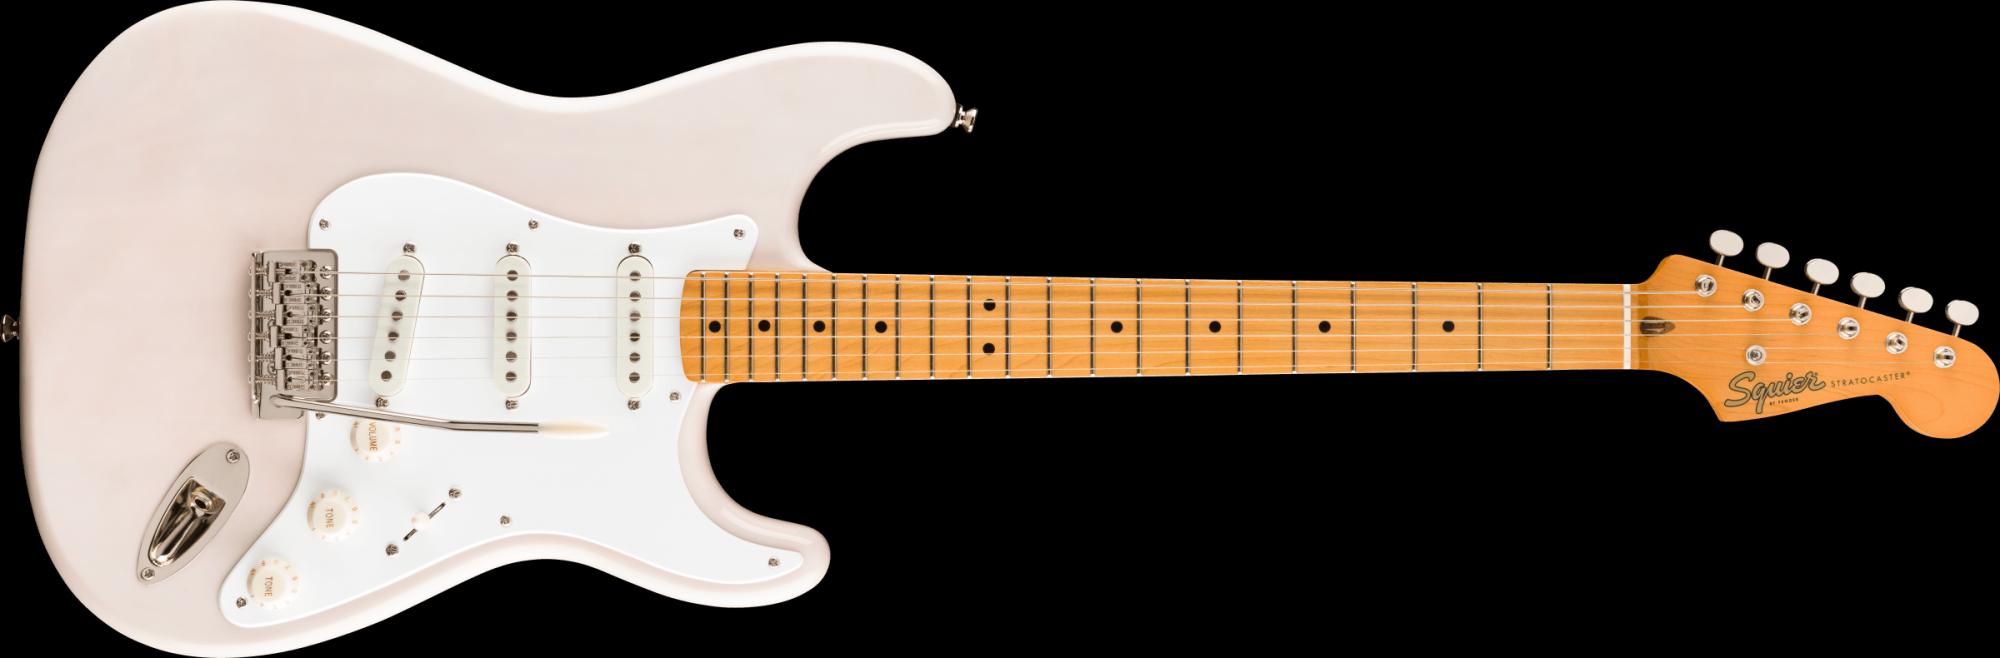 Fender Squire Classic Vibe '50s Stratocaster Maple Fingerboard White Blonde